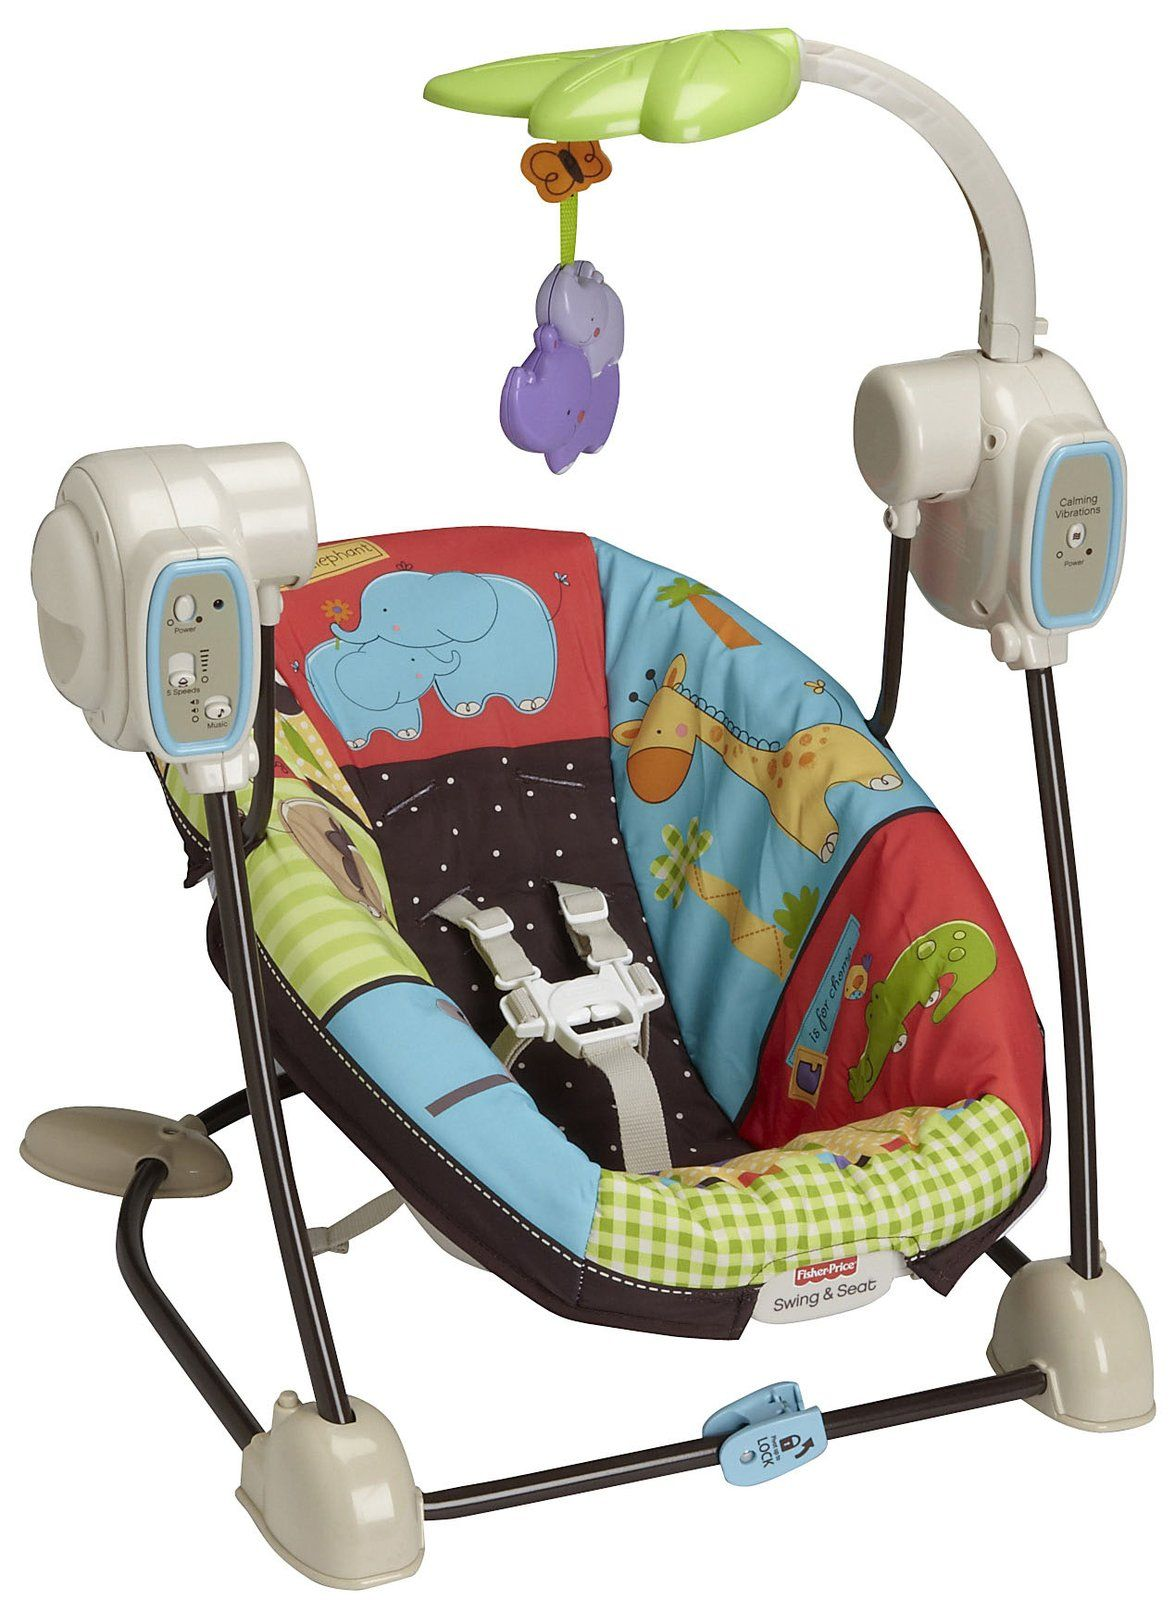 71e9da4b8 Fisher Price Luv U Zoo SpaceSaver Swing   Seat. I like that this is ...